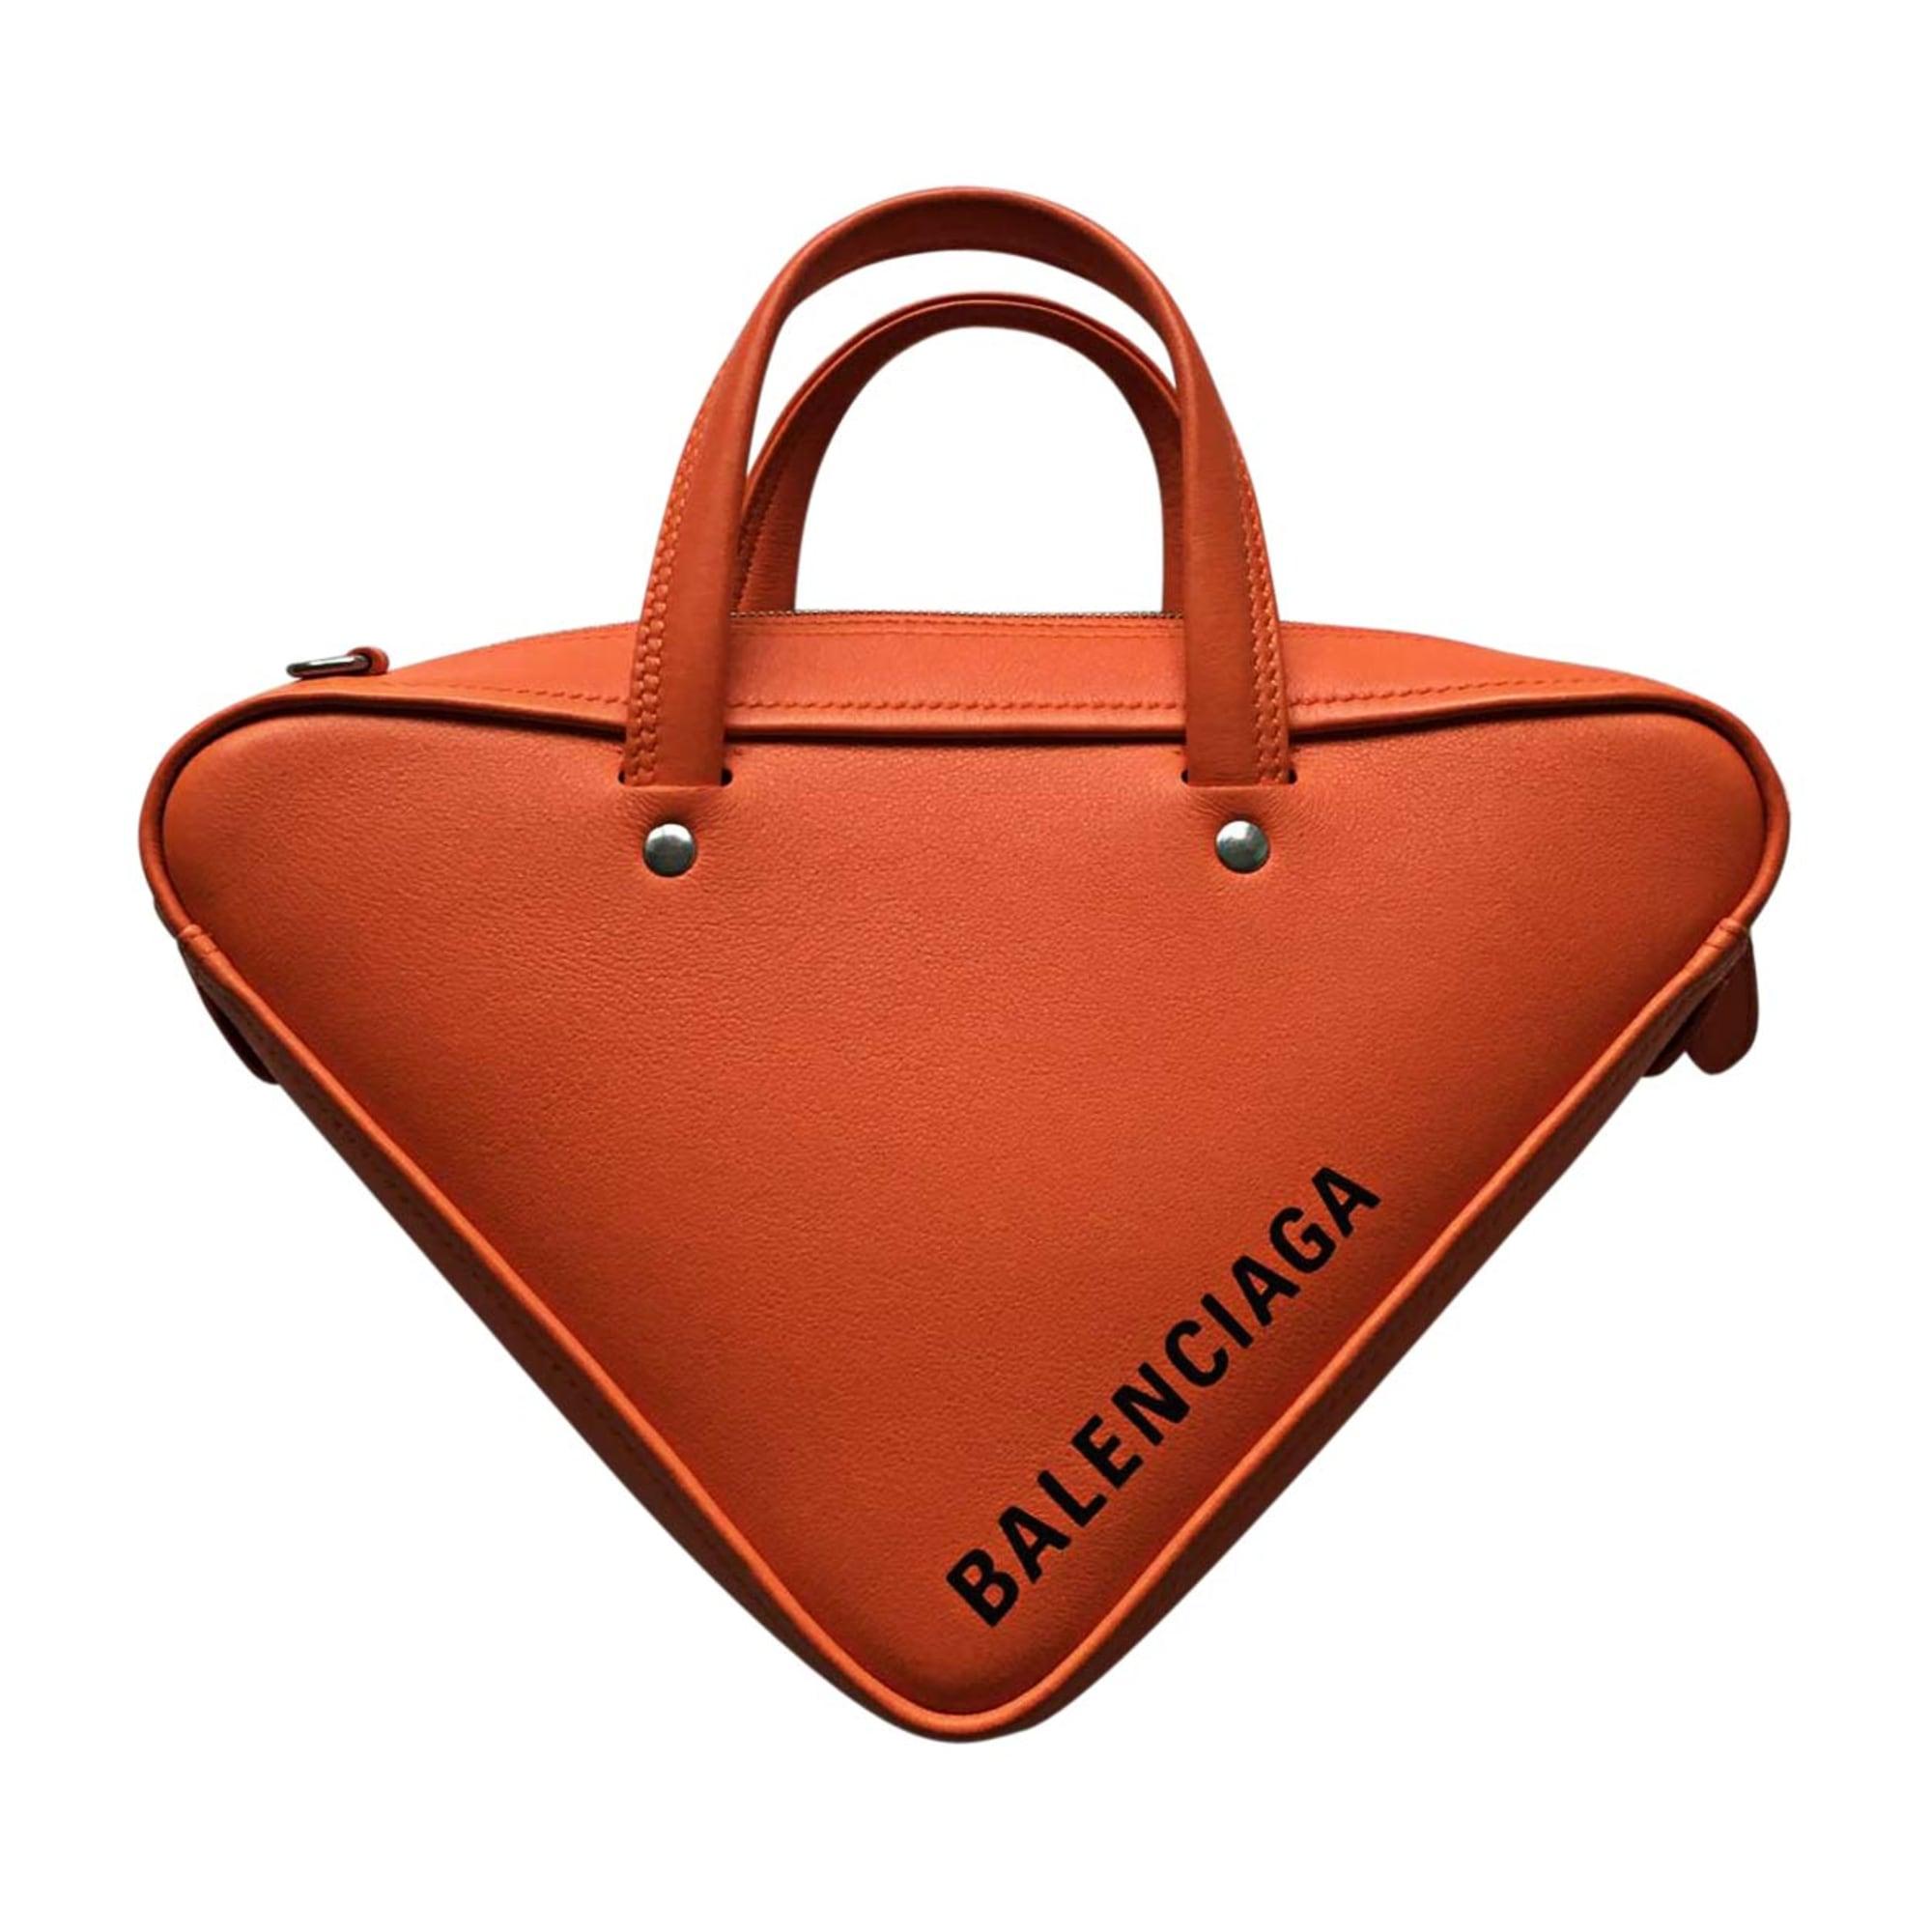 Leather Handbag BALENCIAGA Orange